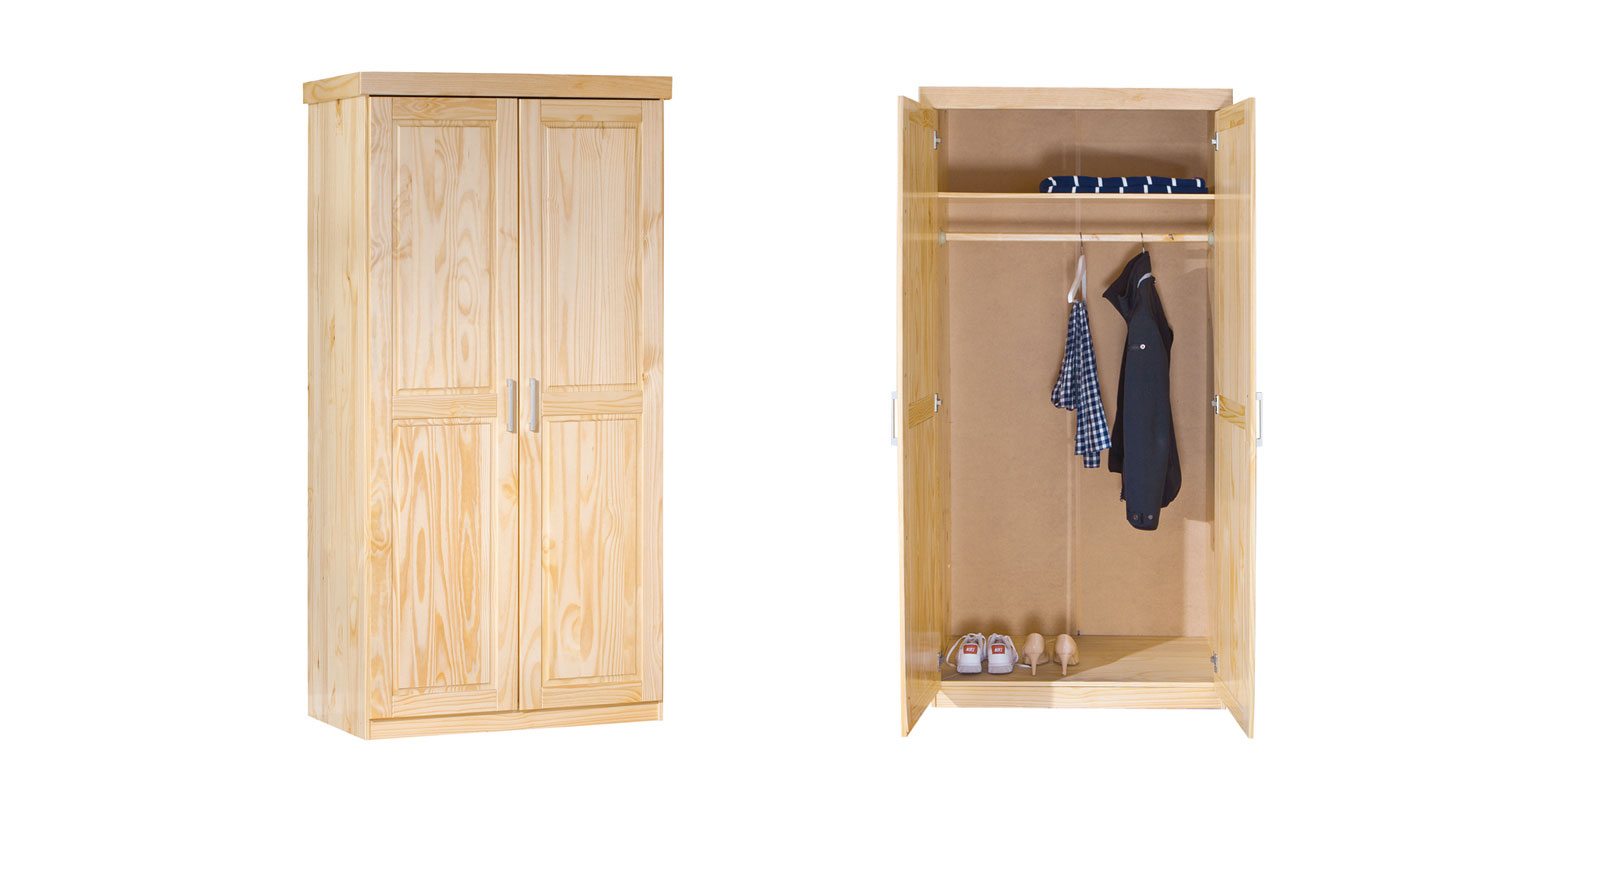 Drehtüren-Kleiderschrank 2-türig aus Massivholz - Ternitz